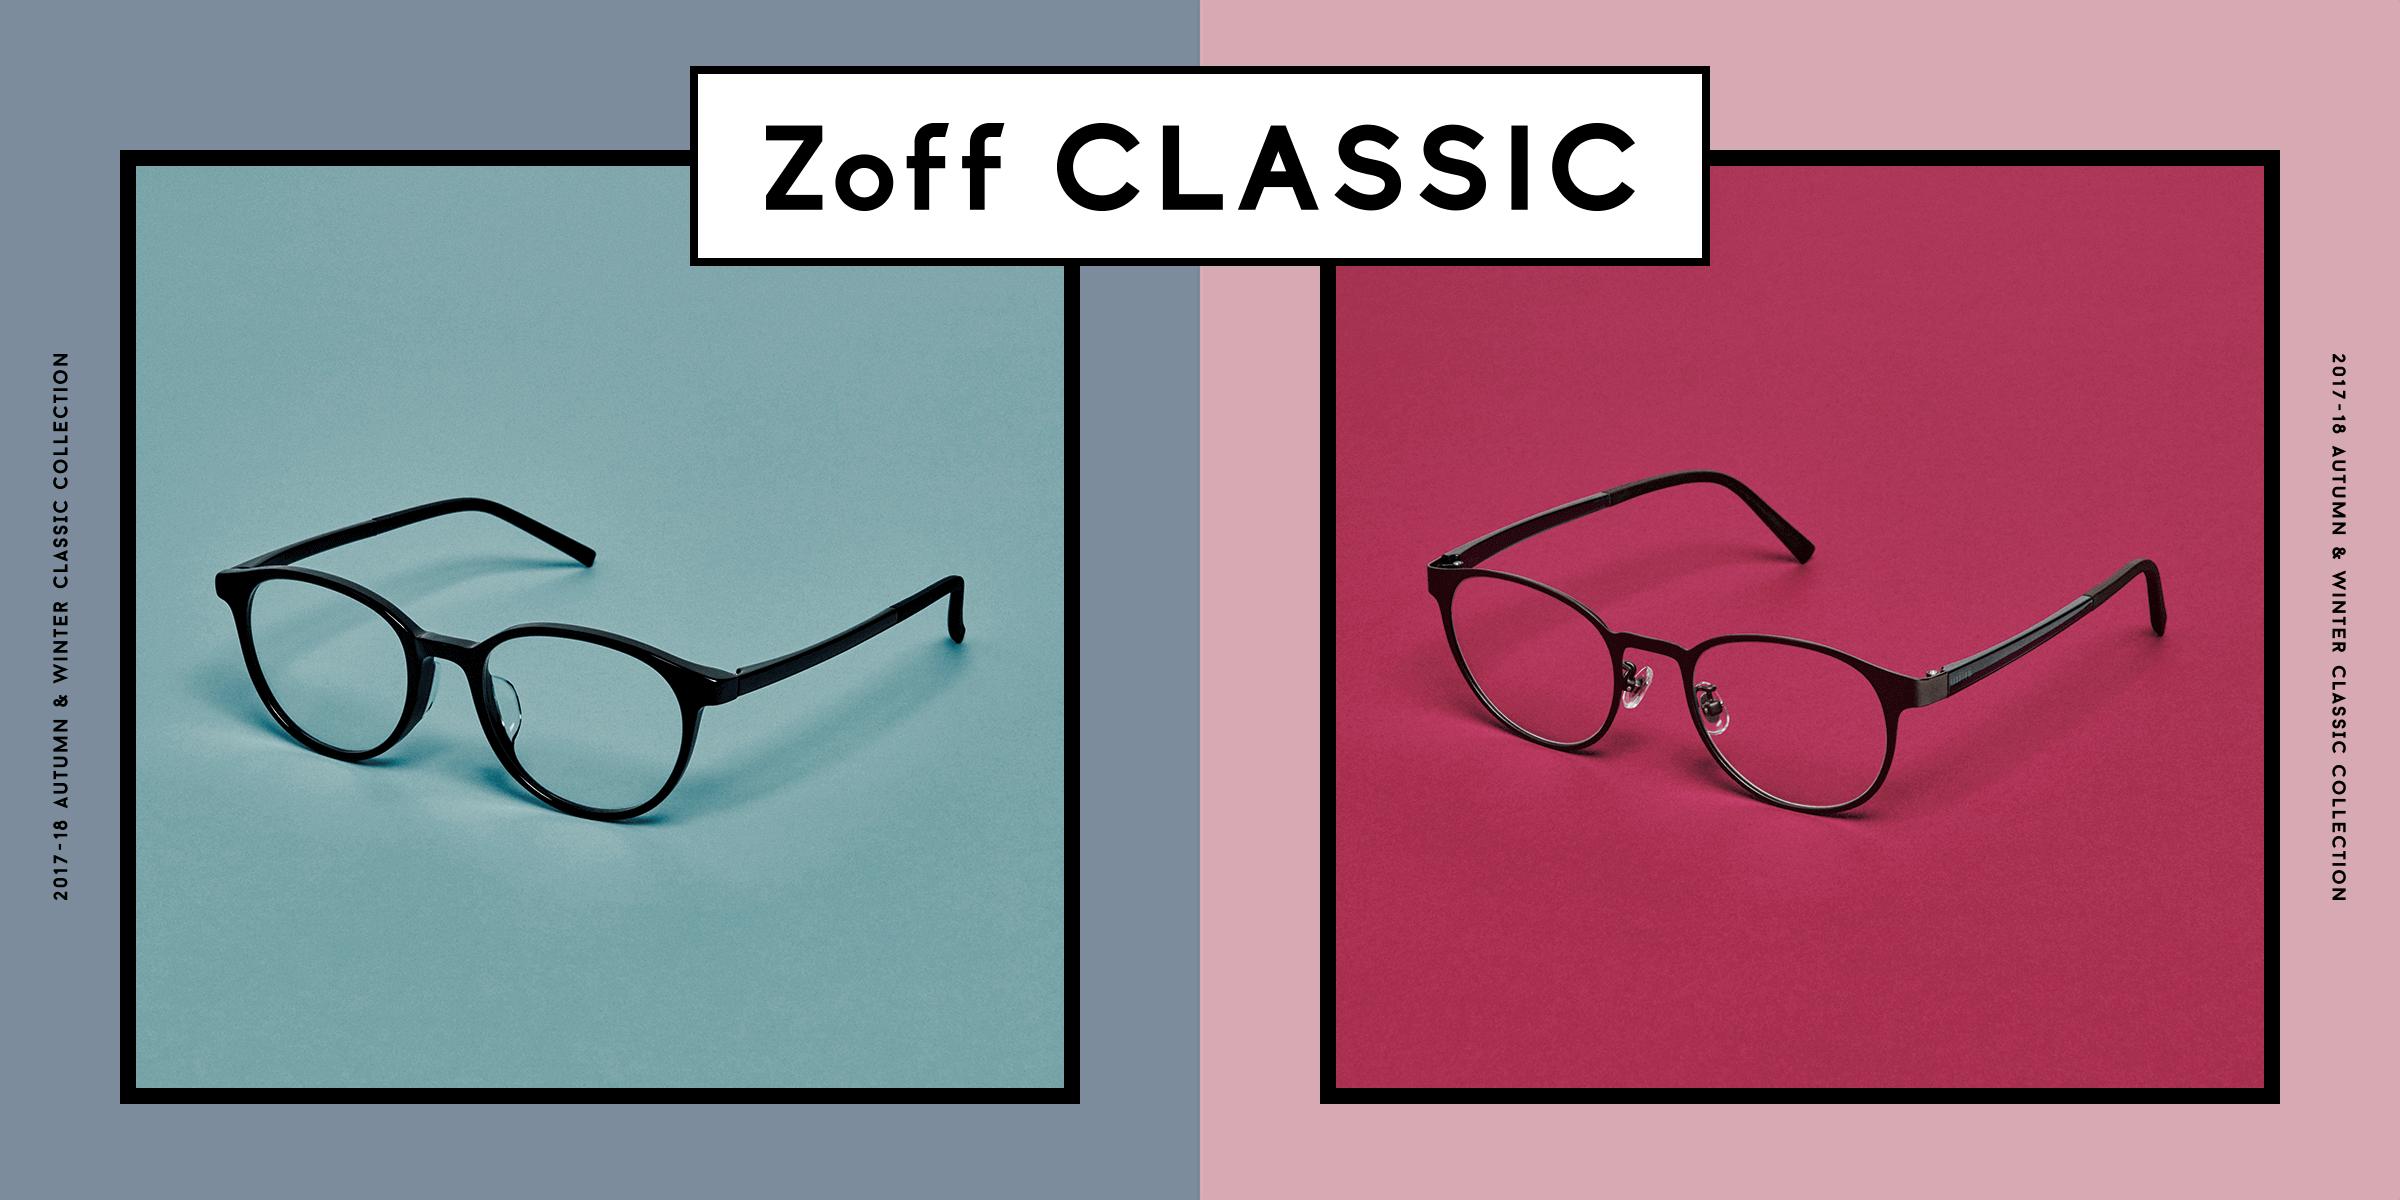 Zoff CLASSIC